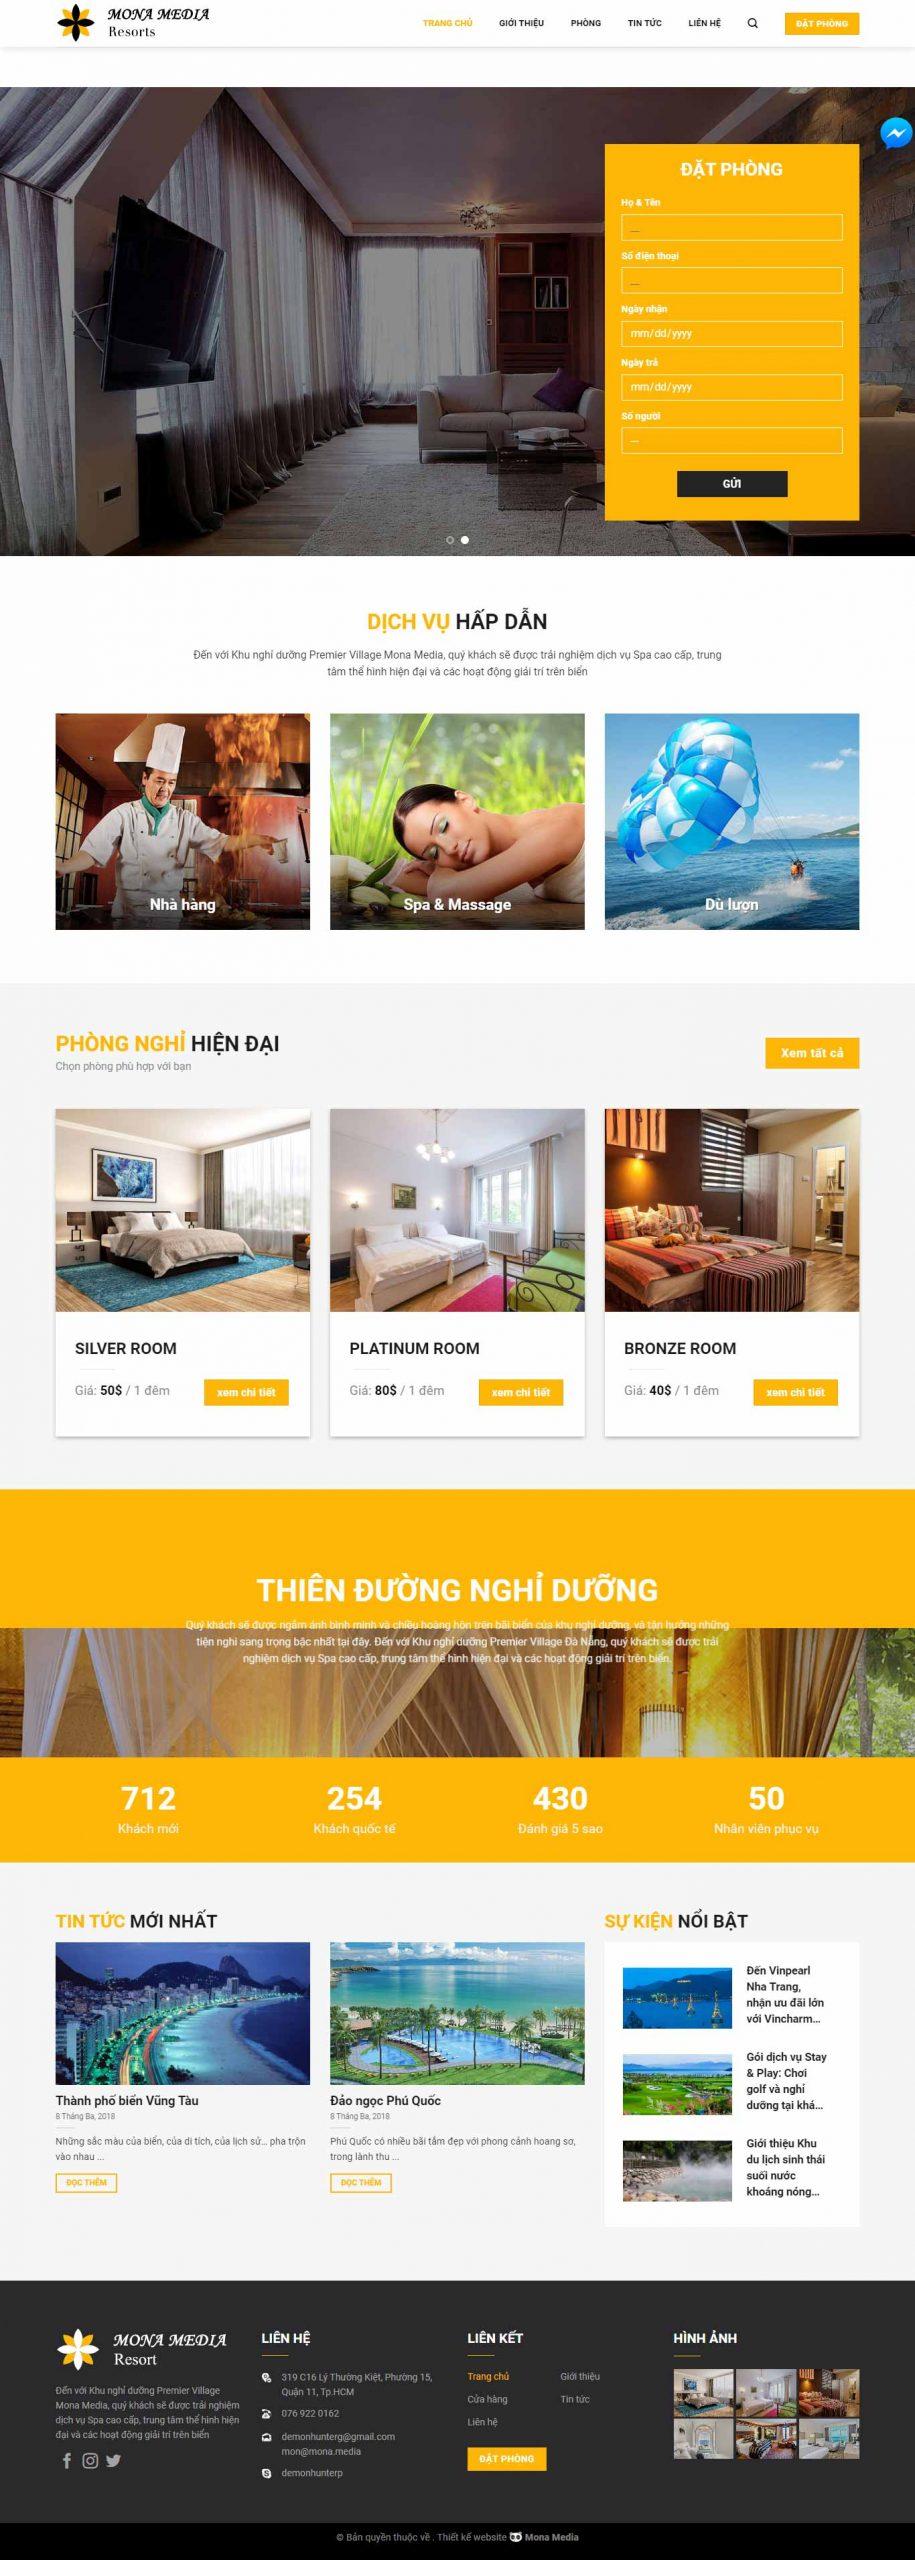 Mẫu Website Khách Sạn Howello